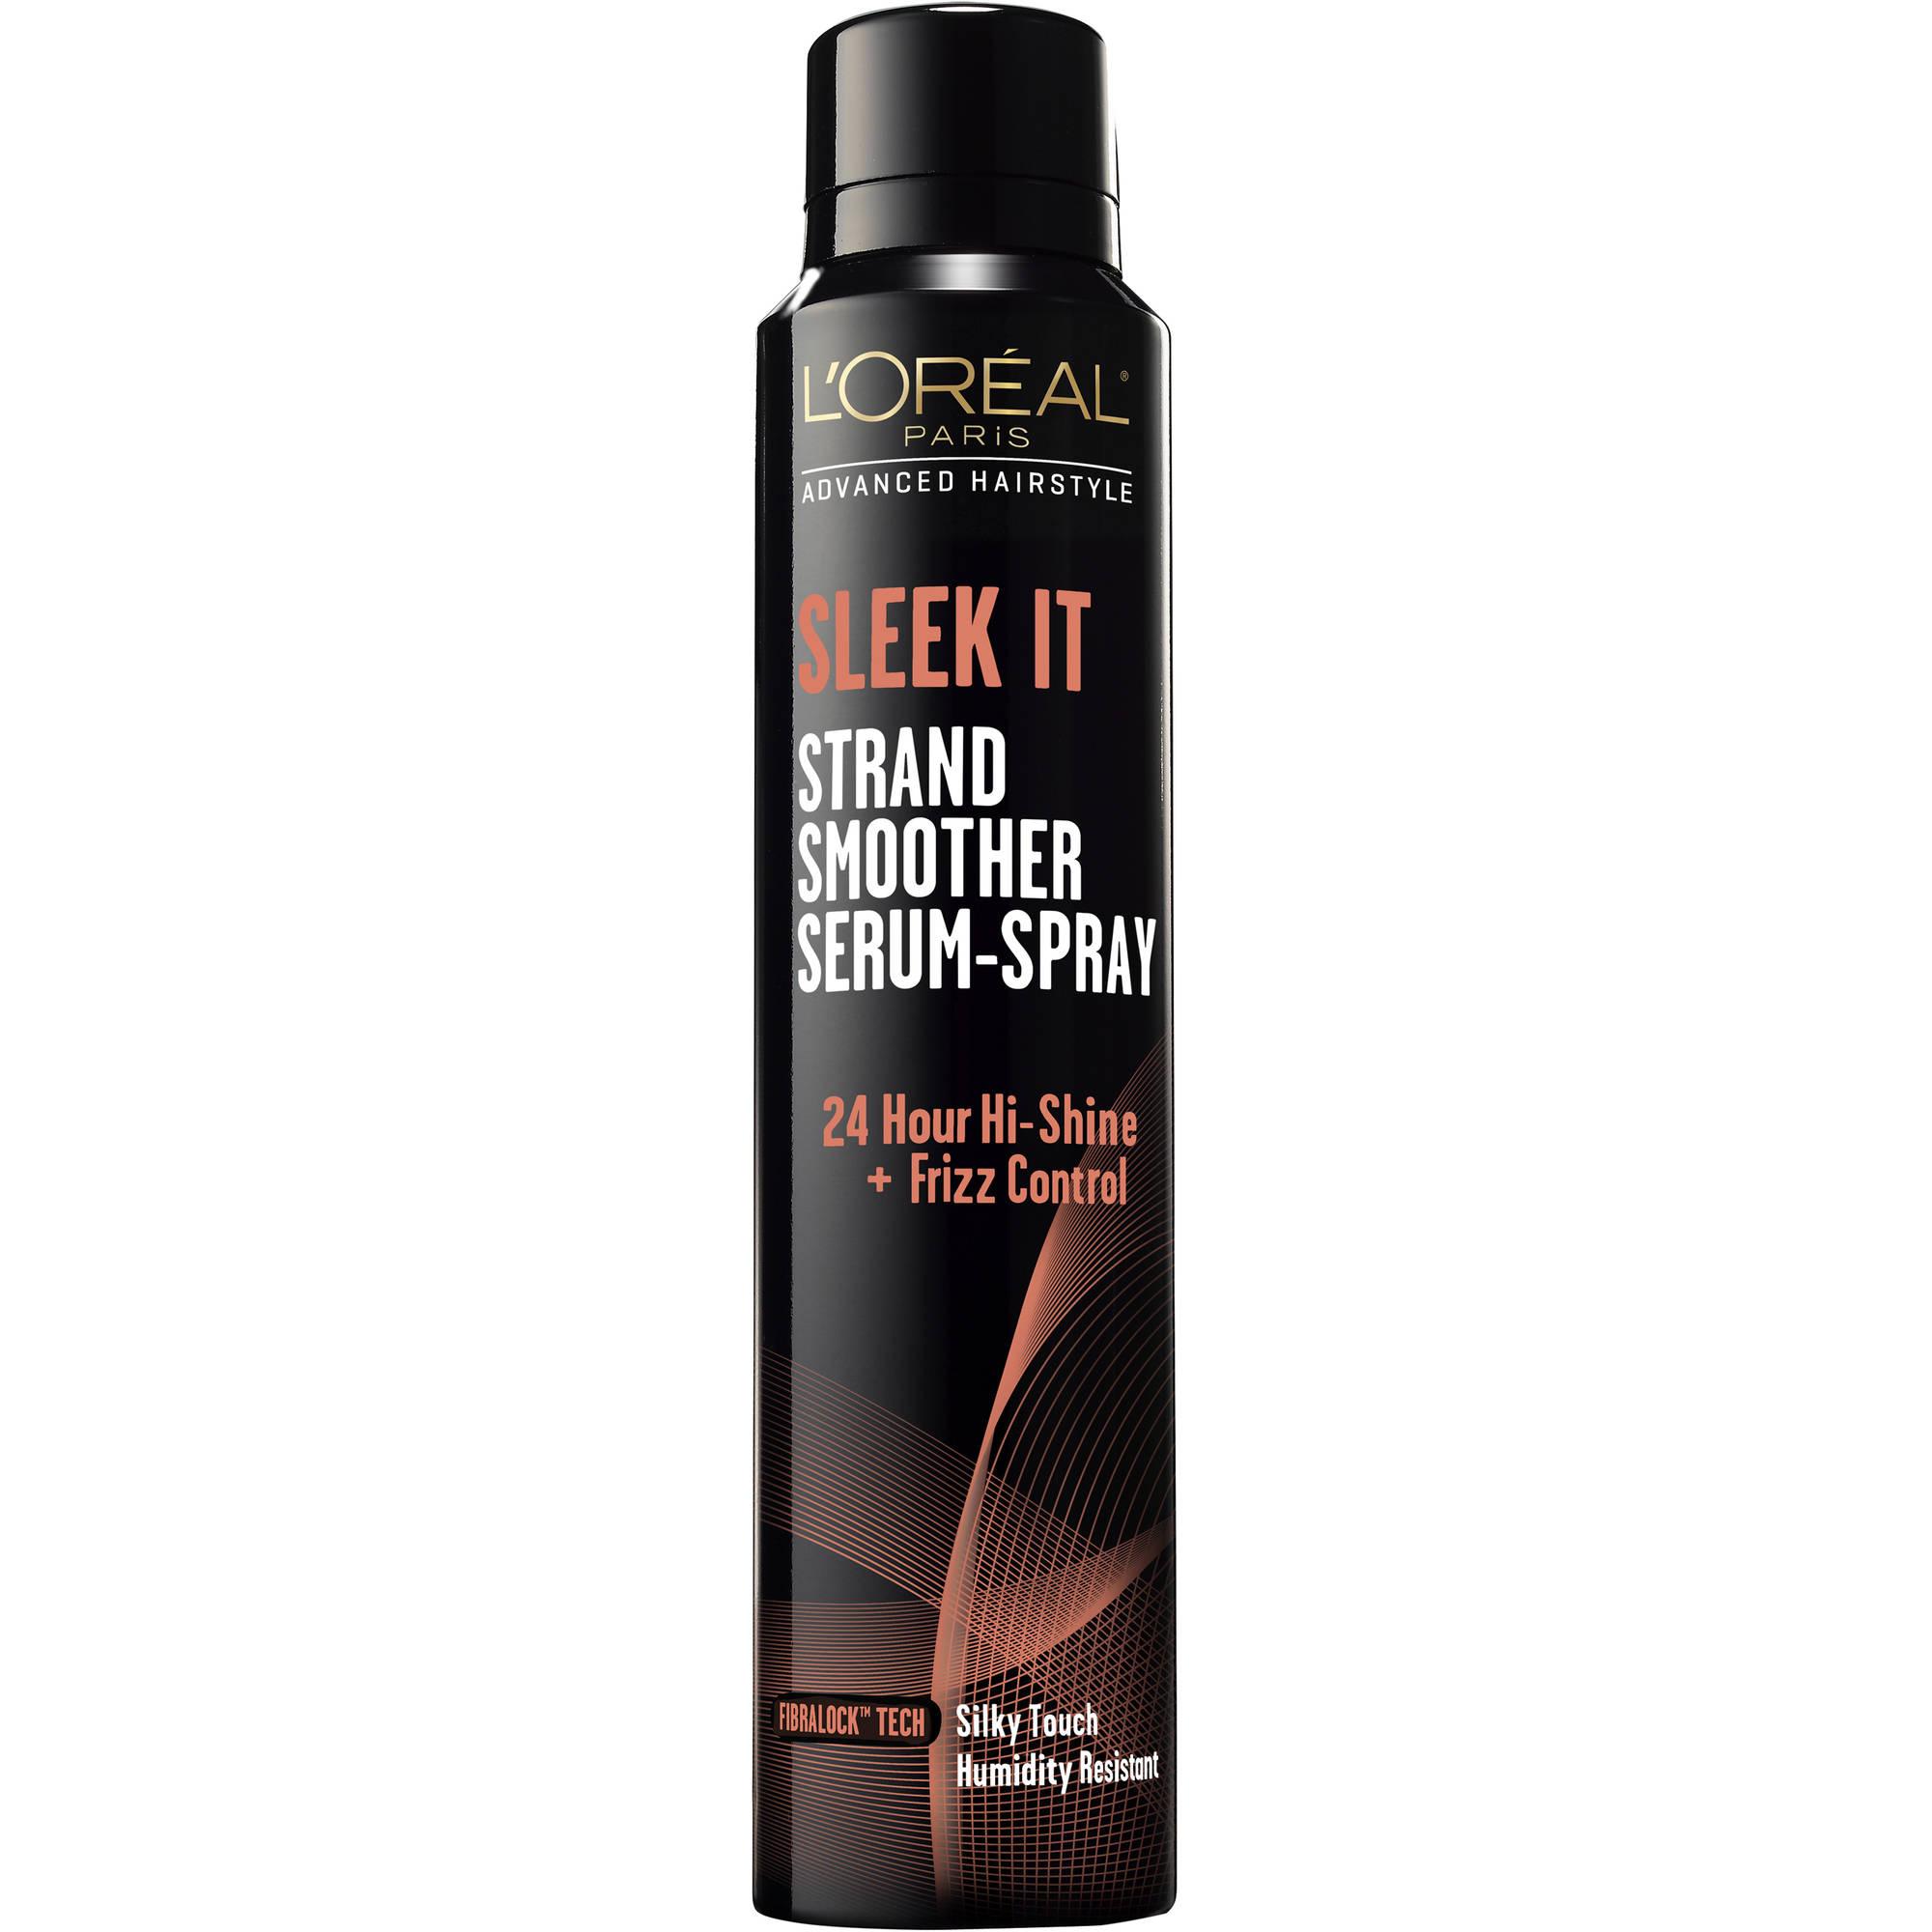 L'Oreal Paris Advanced Hairstyle Sleek It Strand Smoother Serum-Spray, 5.3 oz